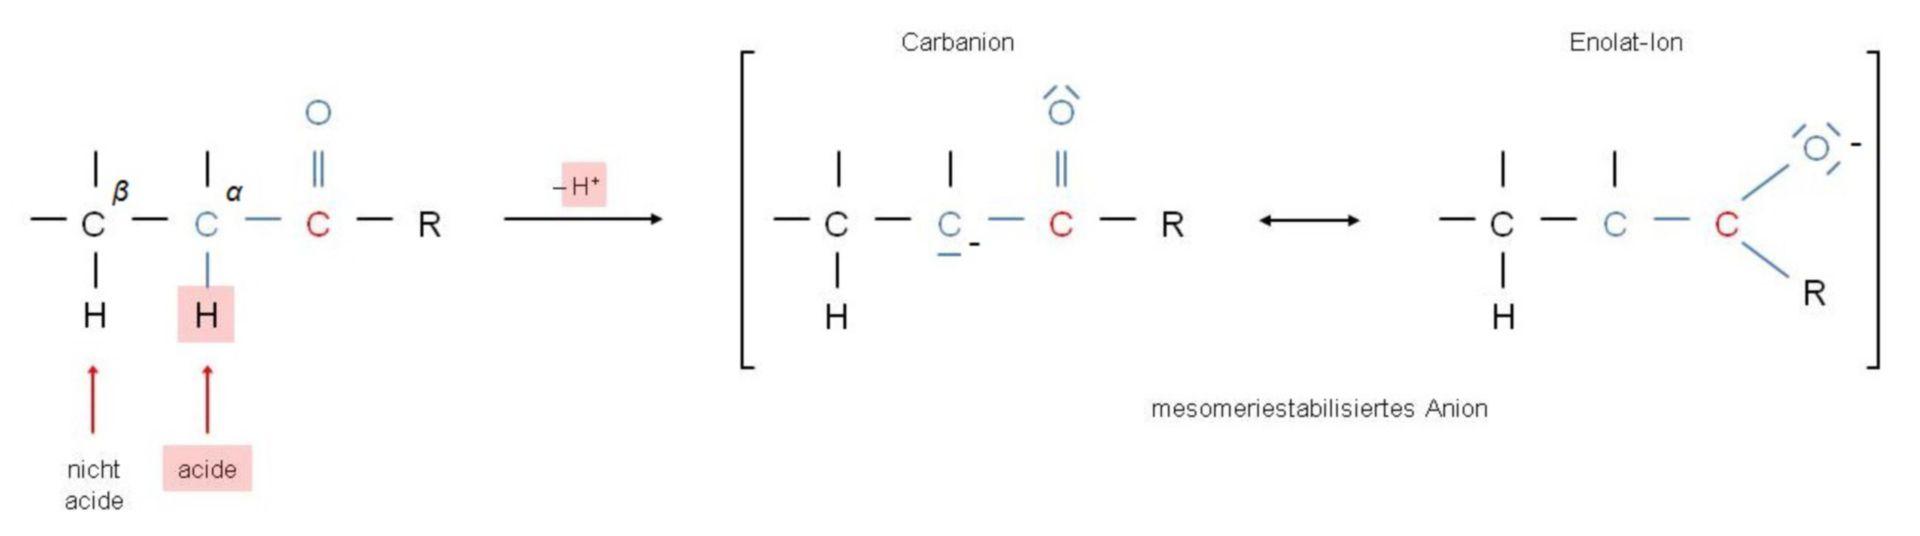 Deprotonization at the alpha-C-atom